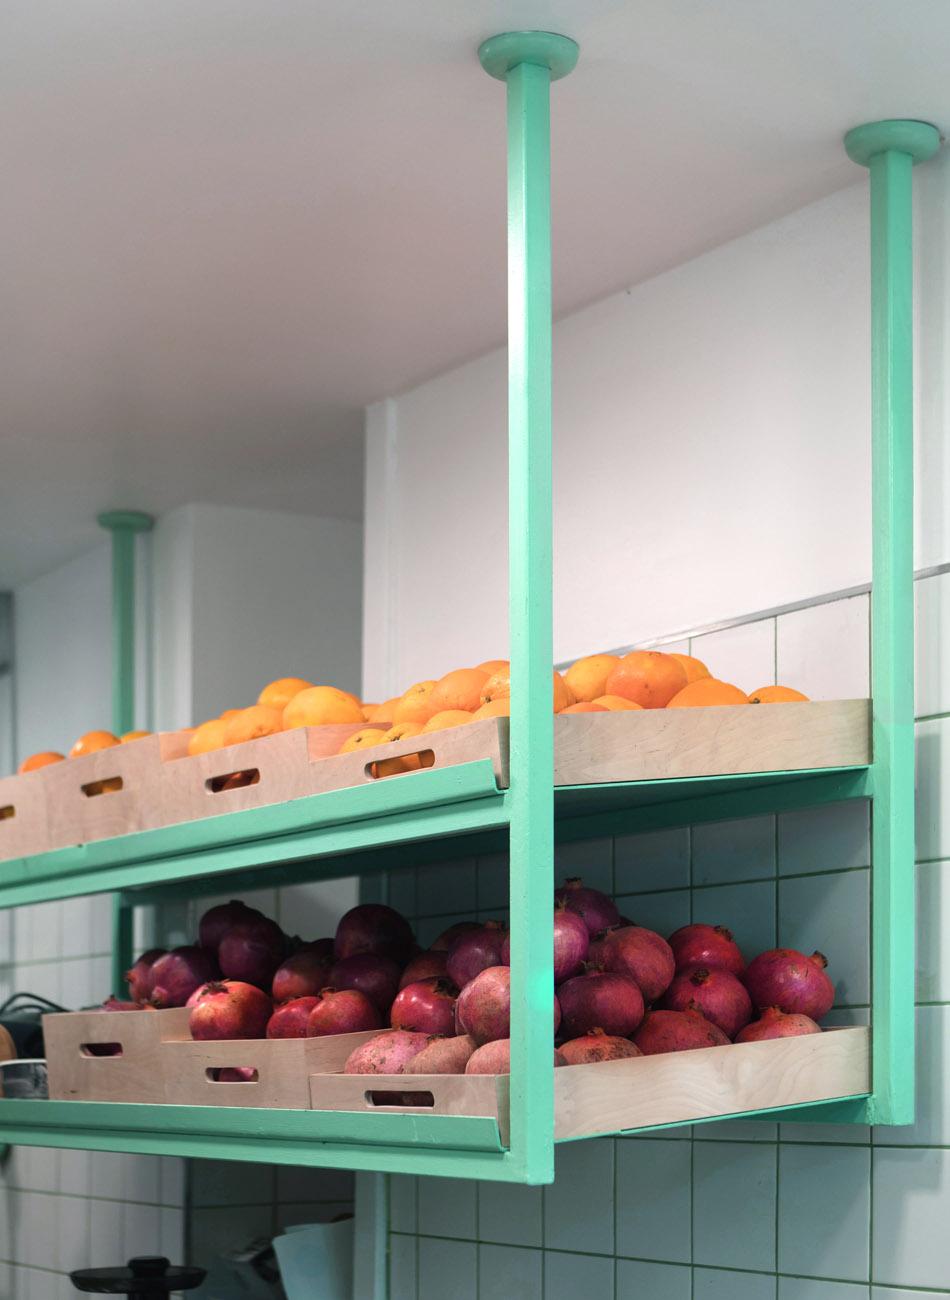 8_Fruitery_pic.jpg